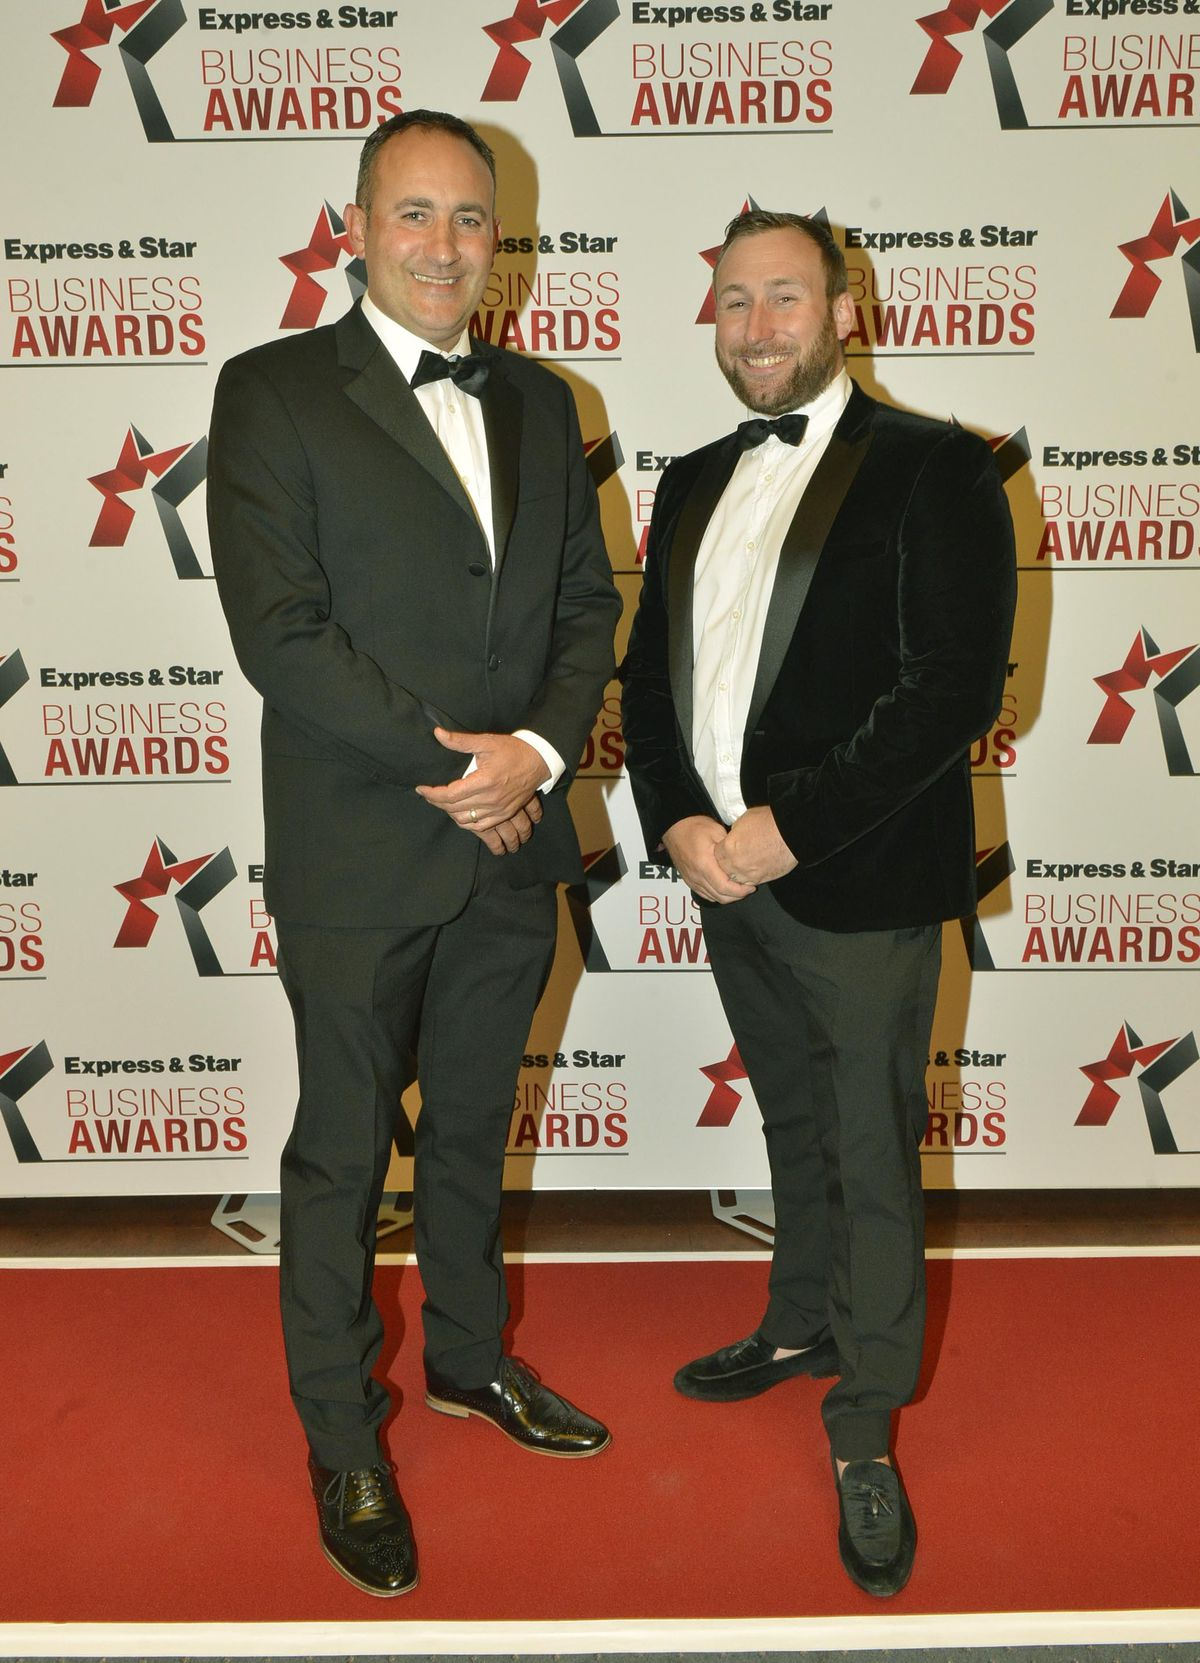 Craig Hart and Jason Ginnall from Homeserve Furniture